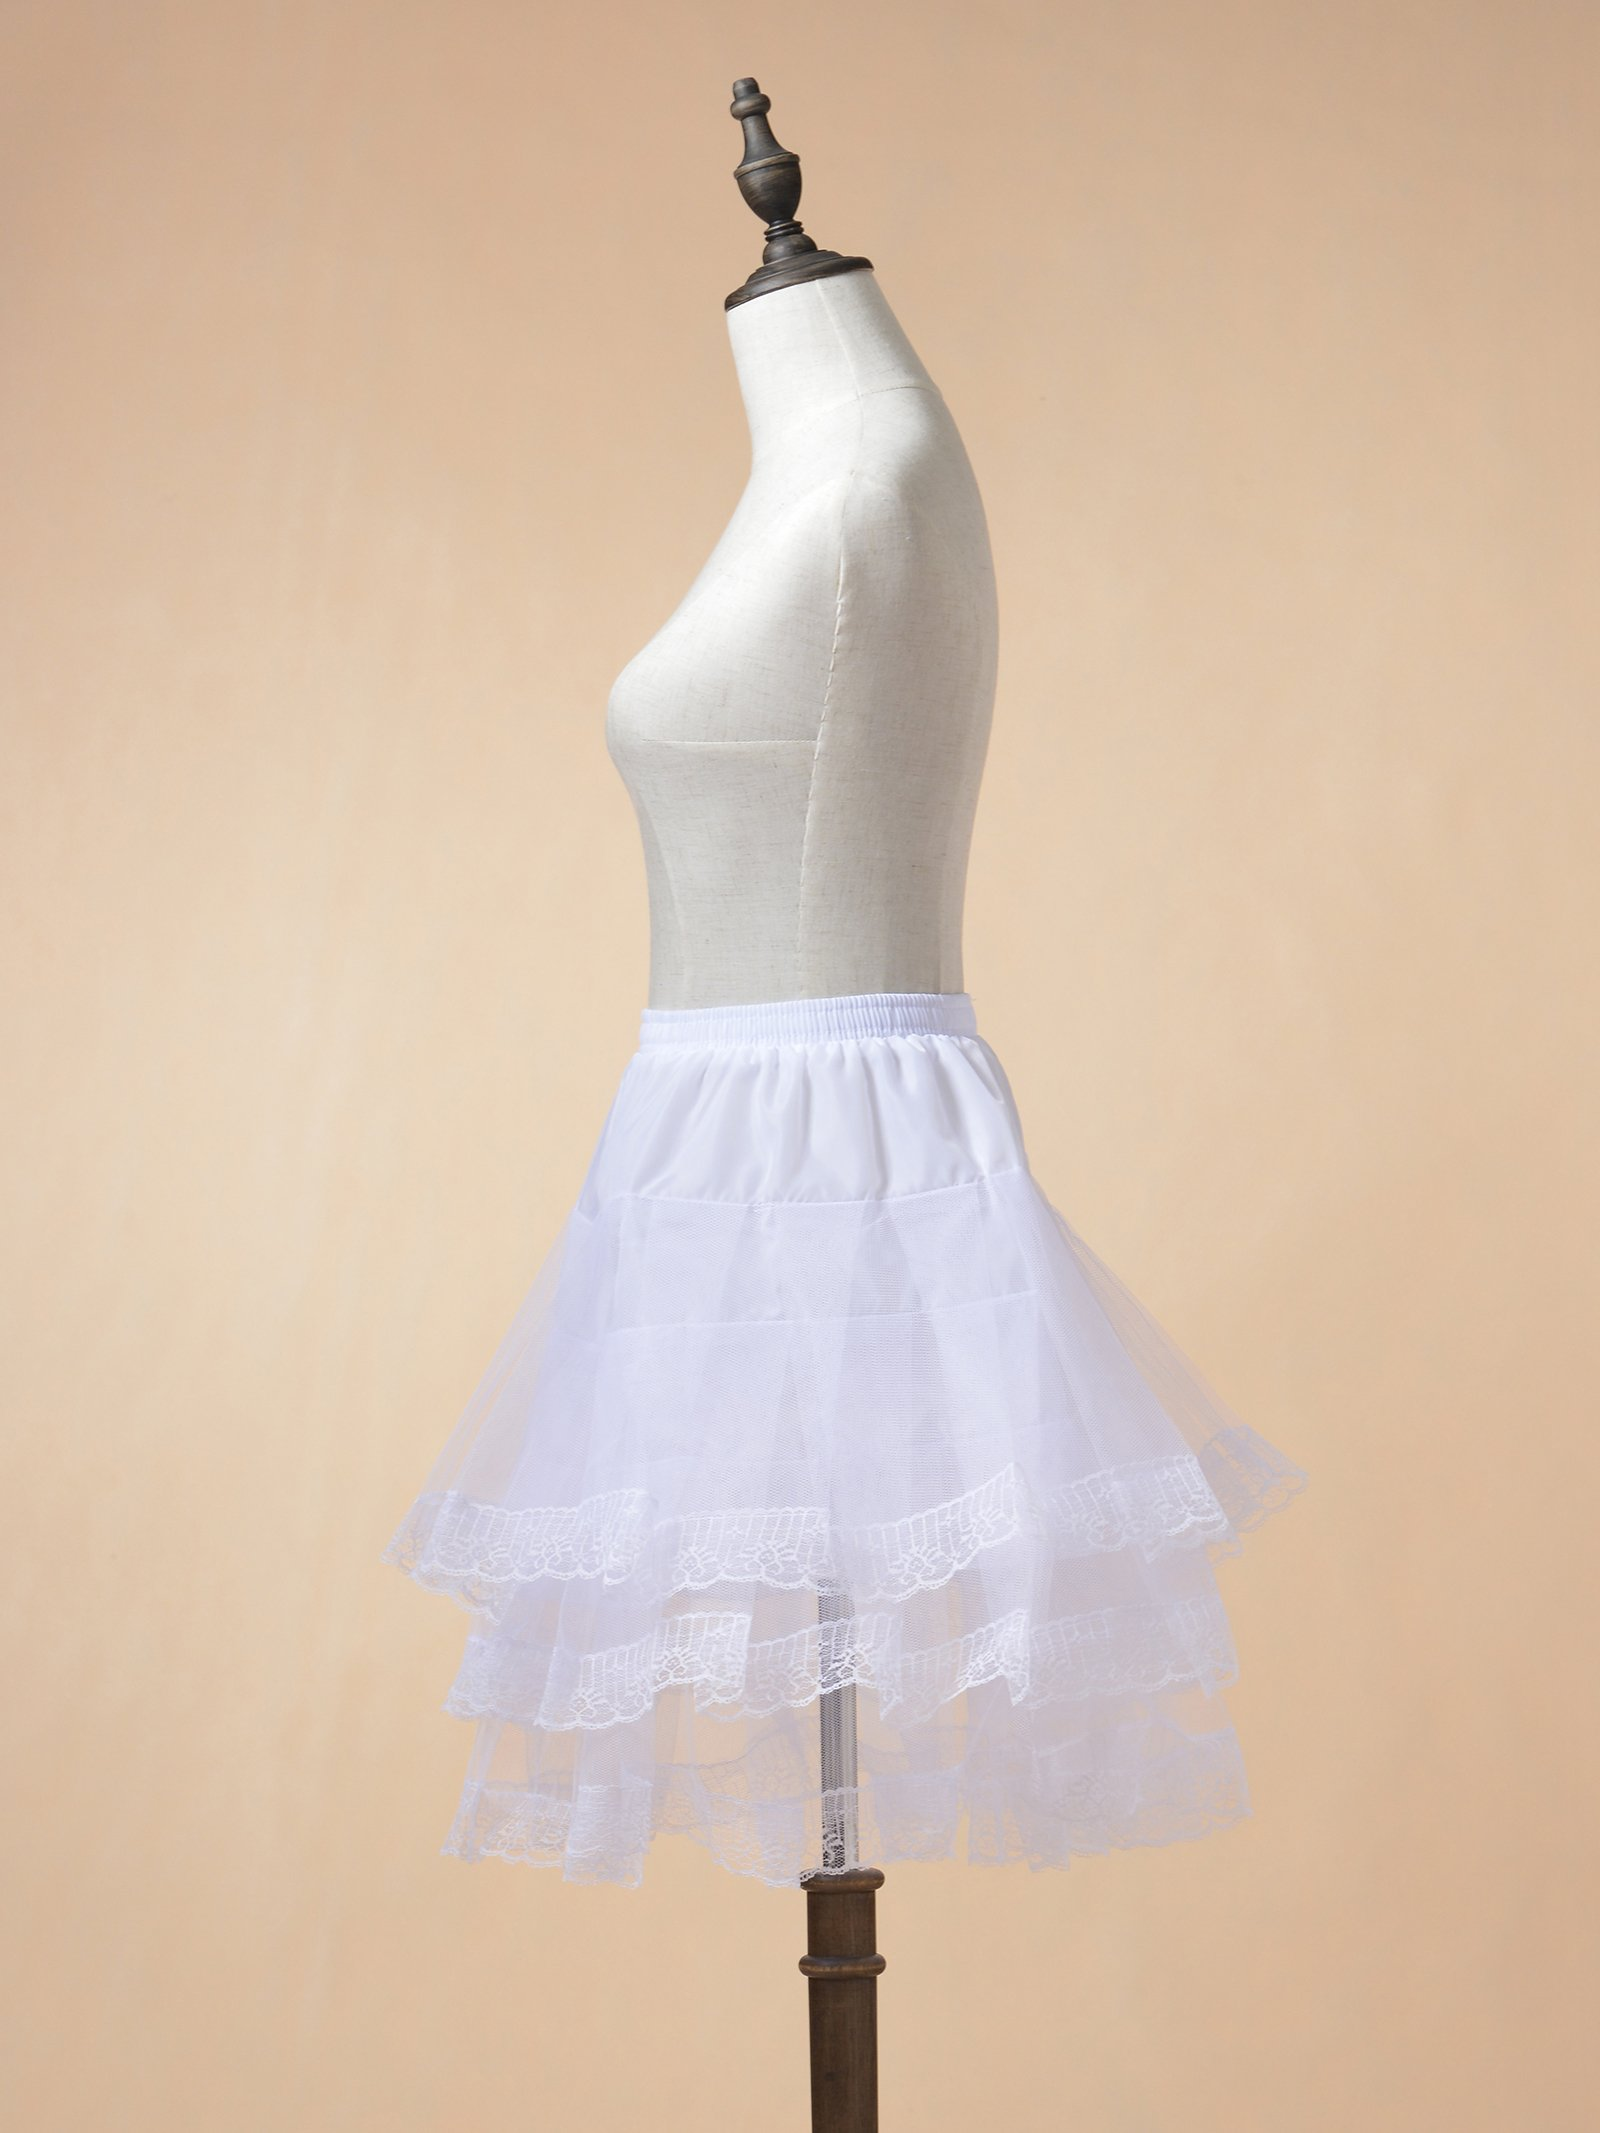 Remedios Kids Mini White Petticoat Flower Girl Wedding Underskirt Cocktail Dress Crinoline Slip White by Remedios (Image #4)